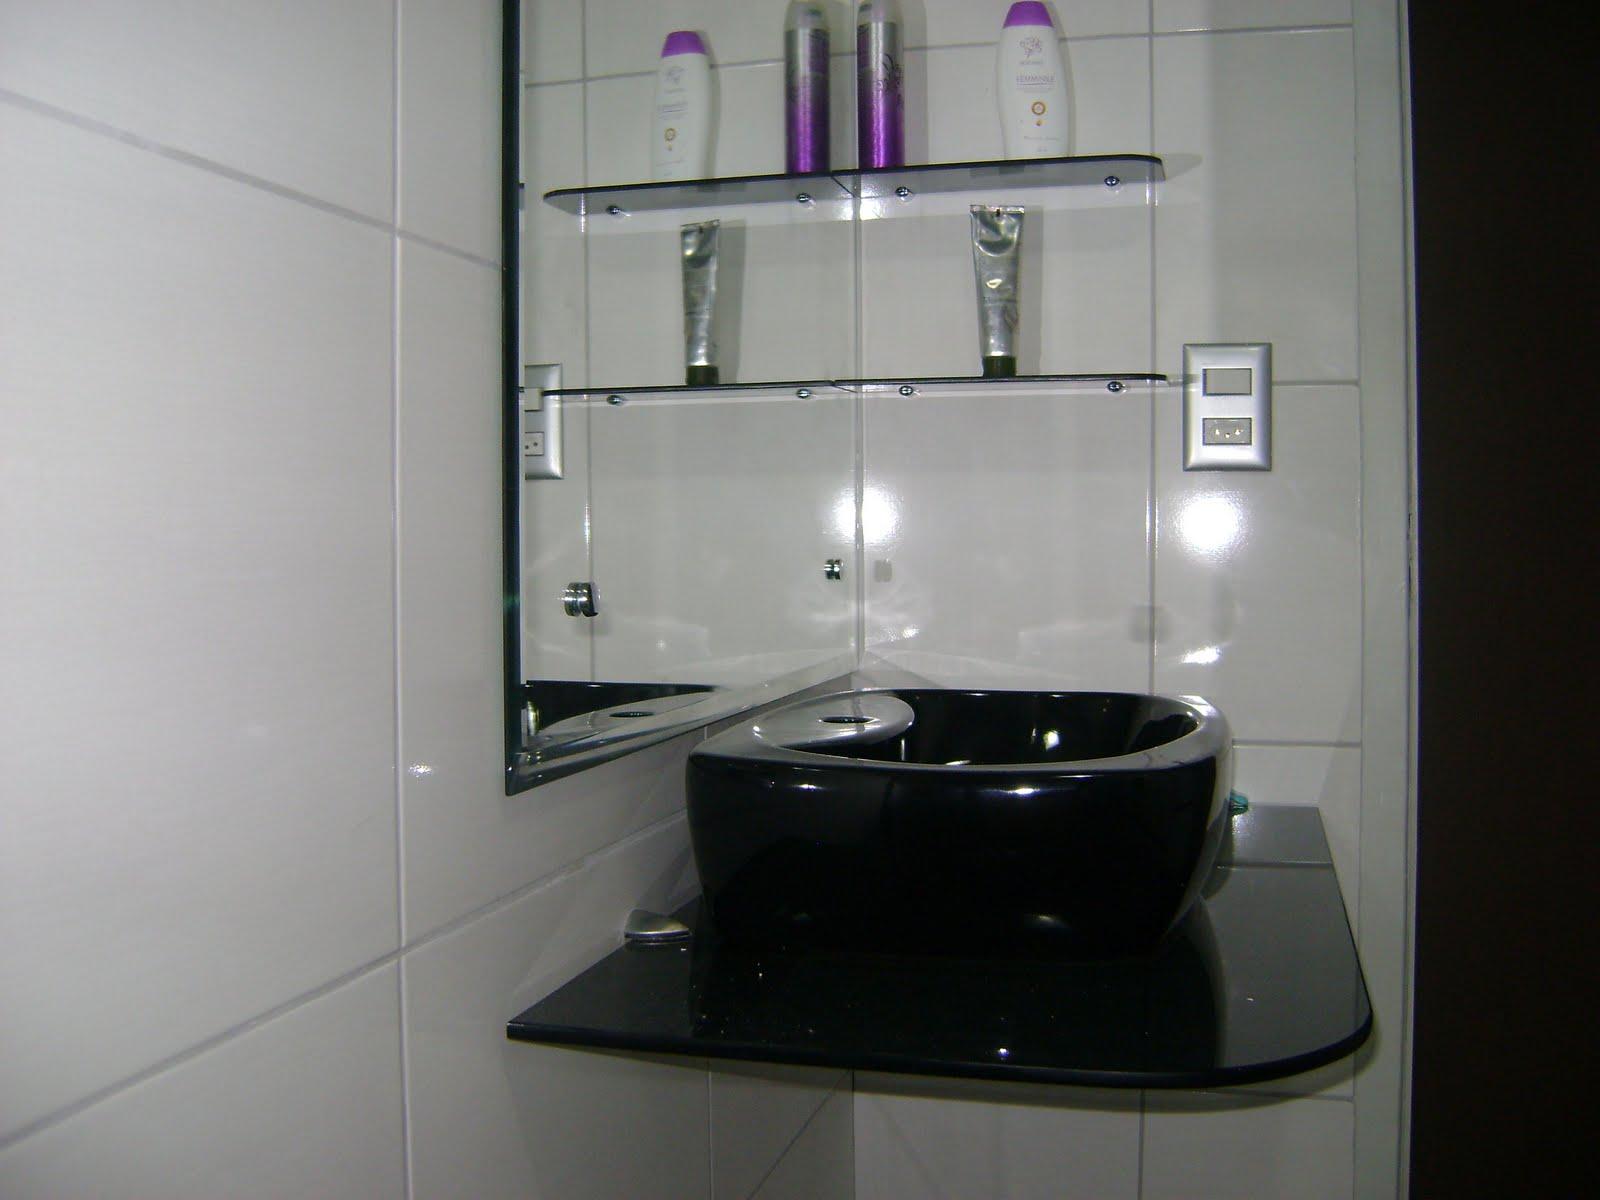 Bazar do Alumínio: BOX BLINDEX PARA BANHEIRO CONFIRA NOSSOS  #161715 1600x1200 Armario De Banheiro De Blindex